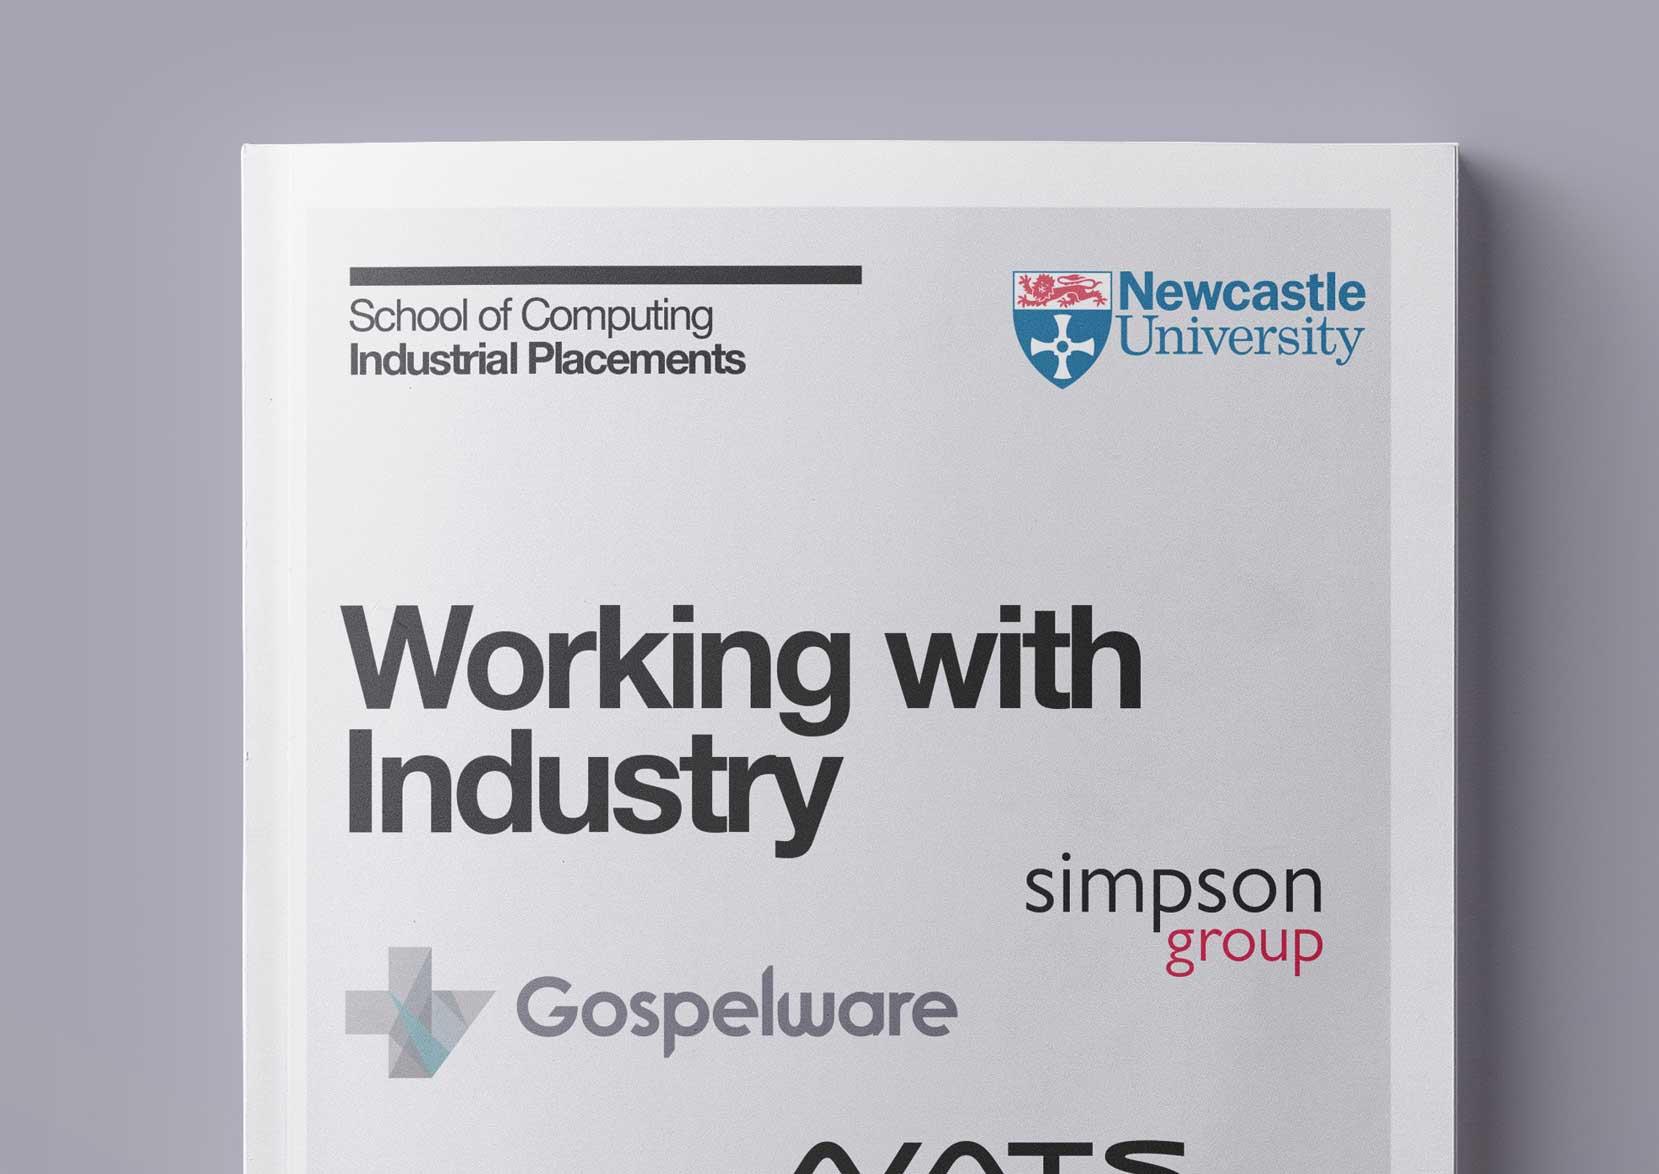 Newcastle_University_Computer_Science3_richardbudddesign.jpg